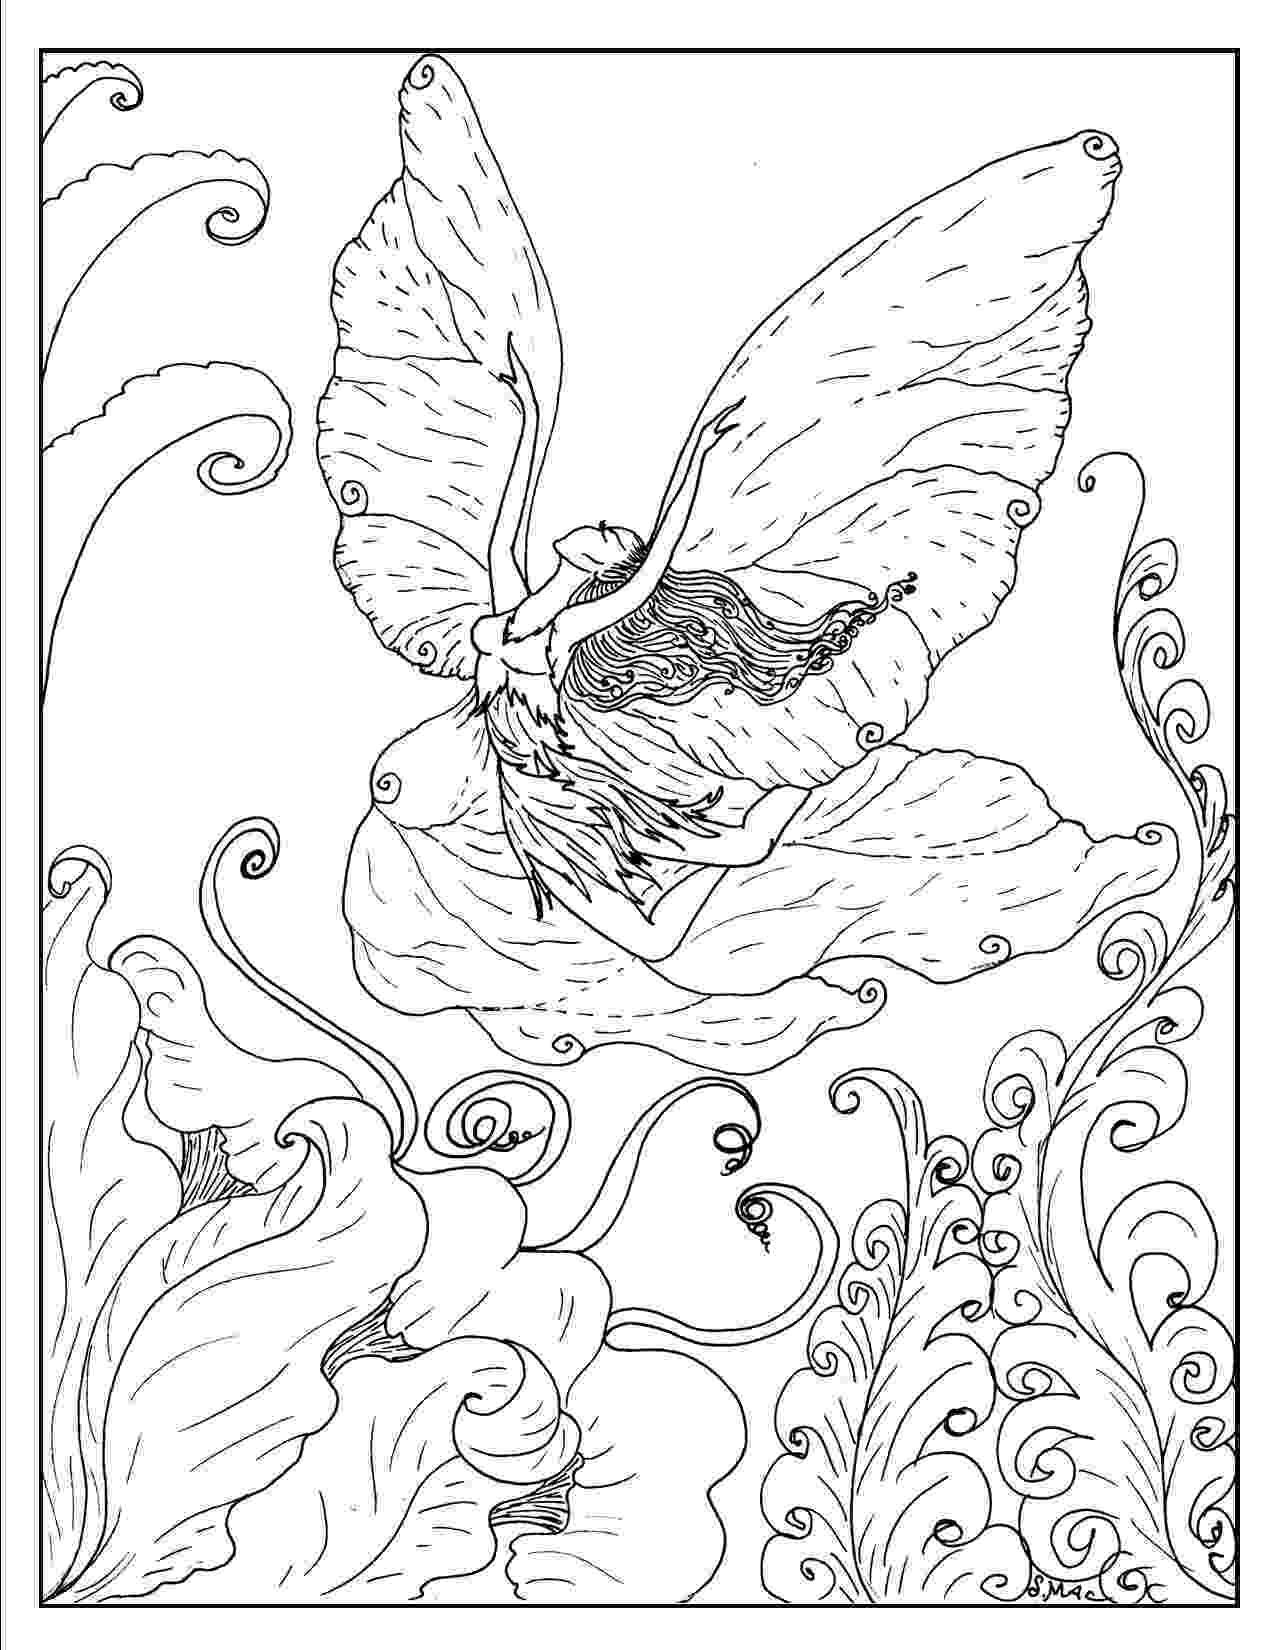 coloring pages fantasy free printable fantasy coloring pages for kids best fantasy pages coloring 1 1